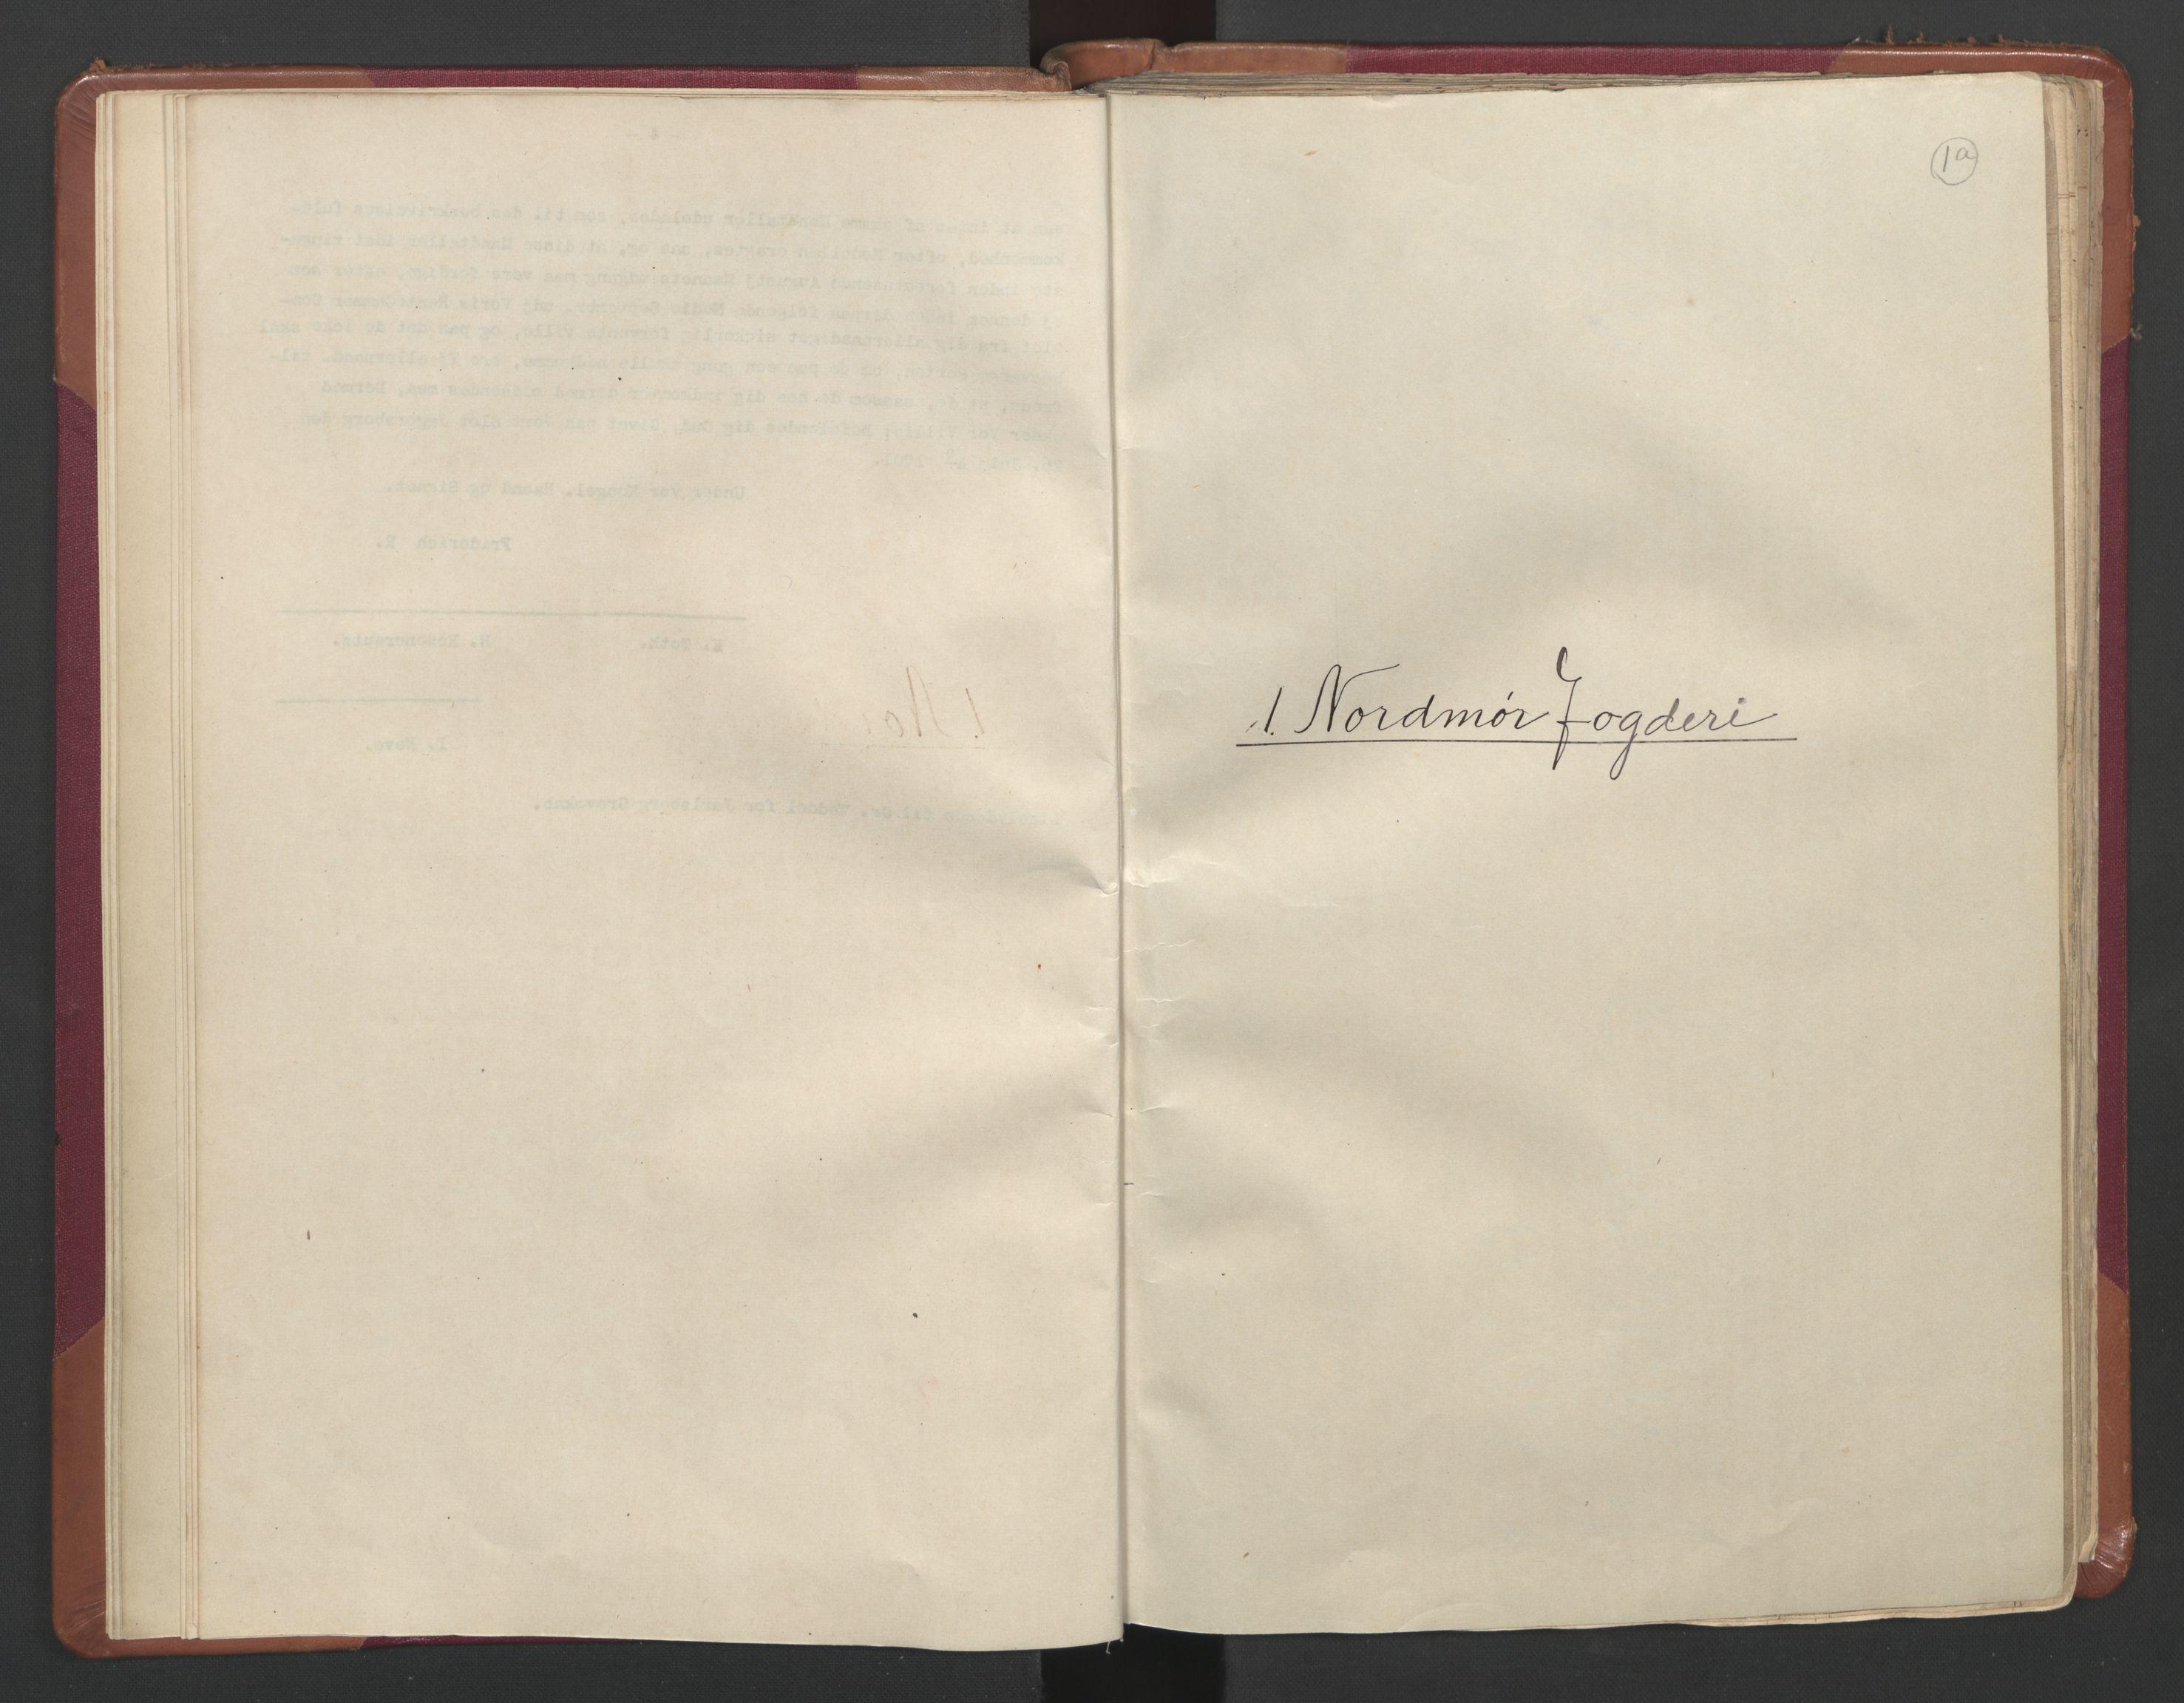 RA, Manntallet 1701, nr. 11: Nordmøre fogderi og Romsdal fogderi, 1701, s. 1a